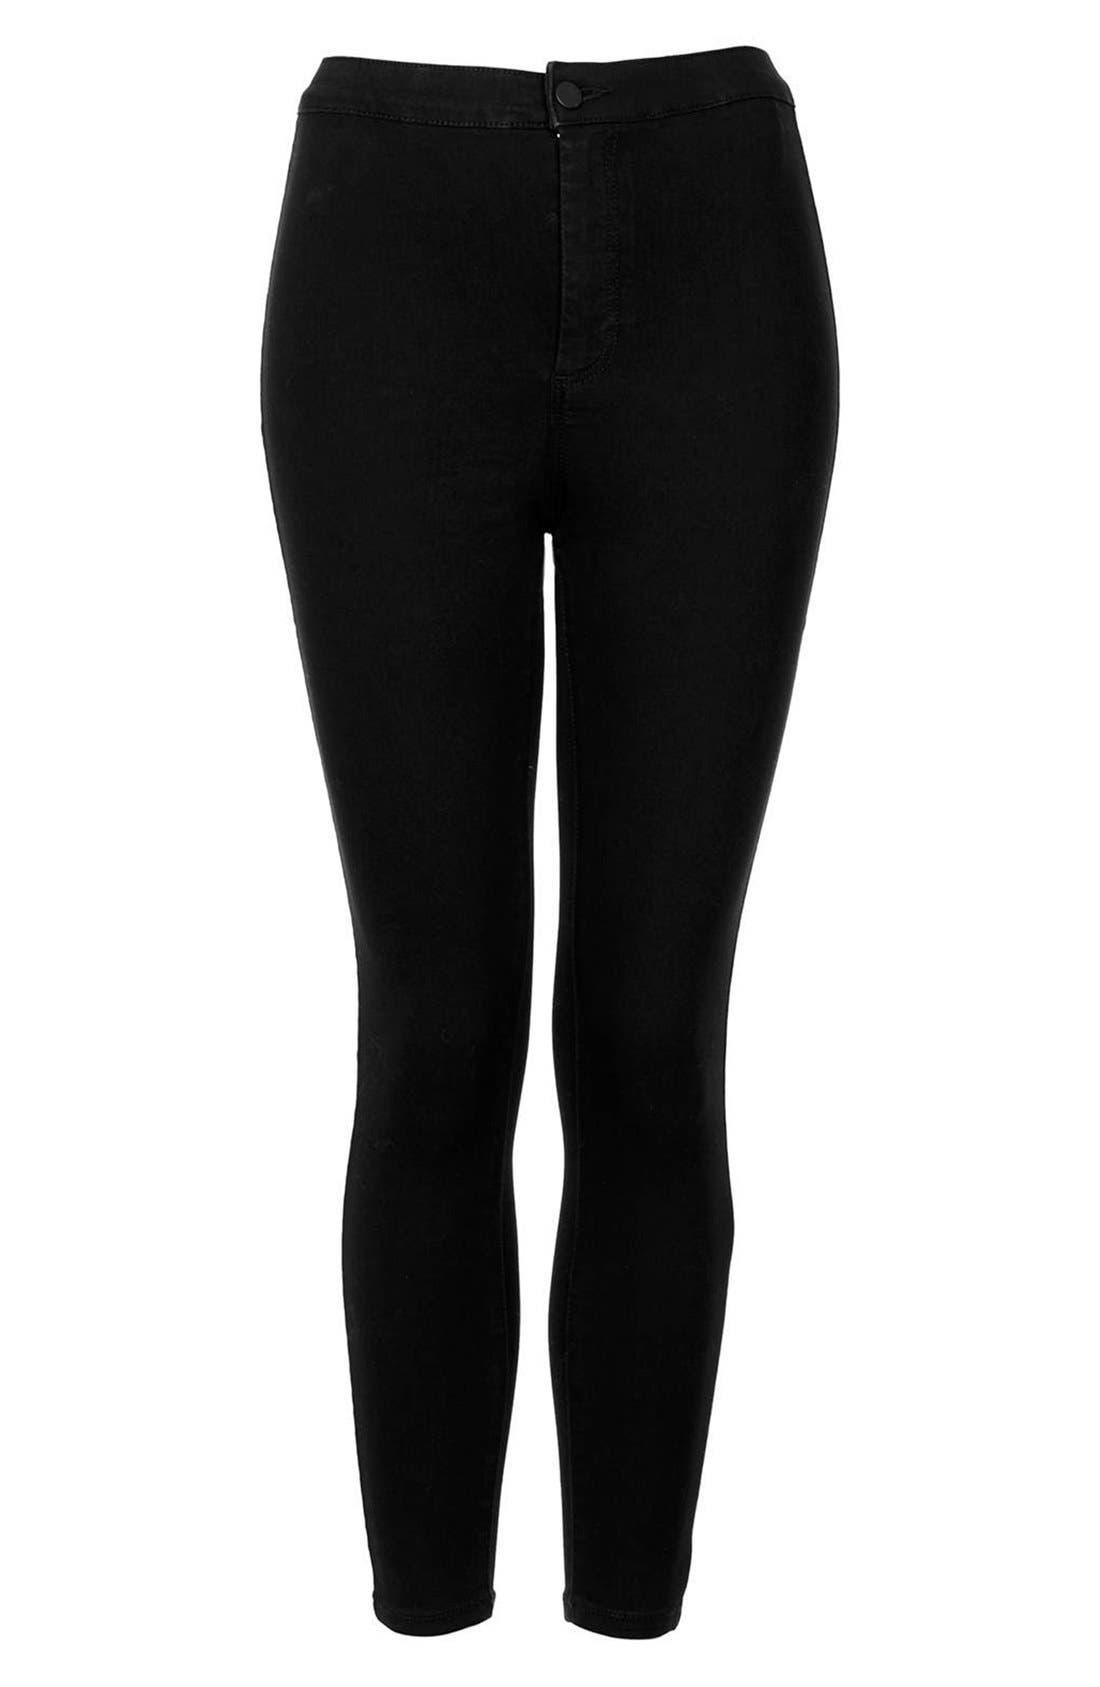 Alternate Image 3  - Topshop Moto 'Joni' High Rise Skinny Jeans